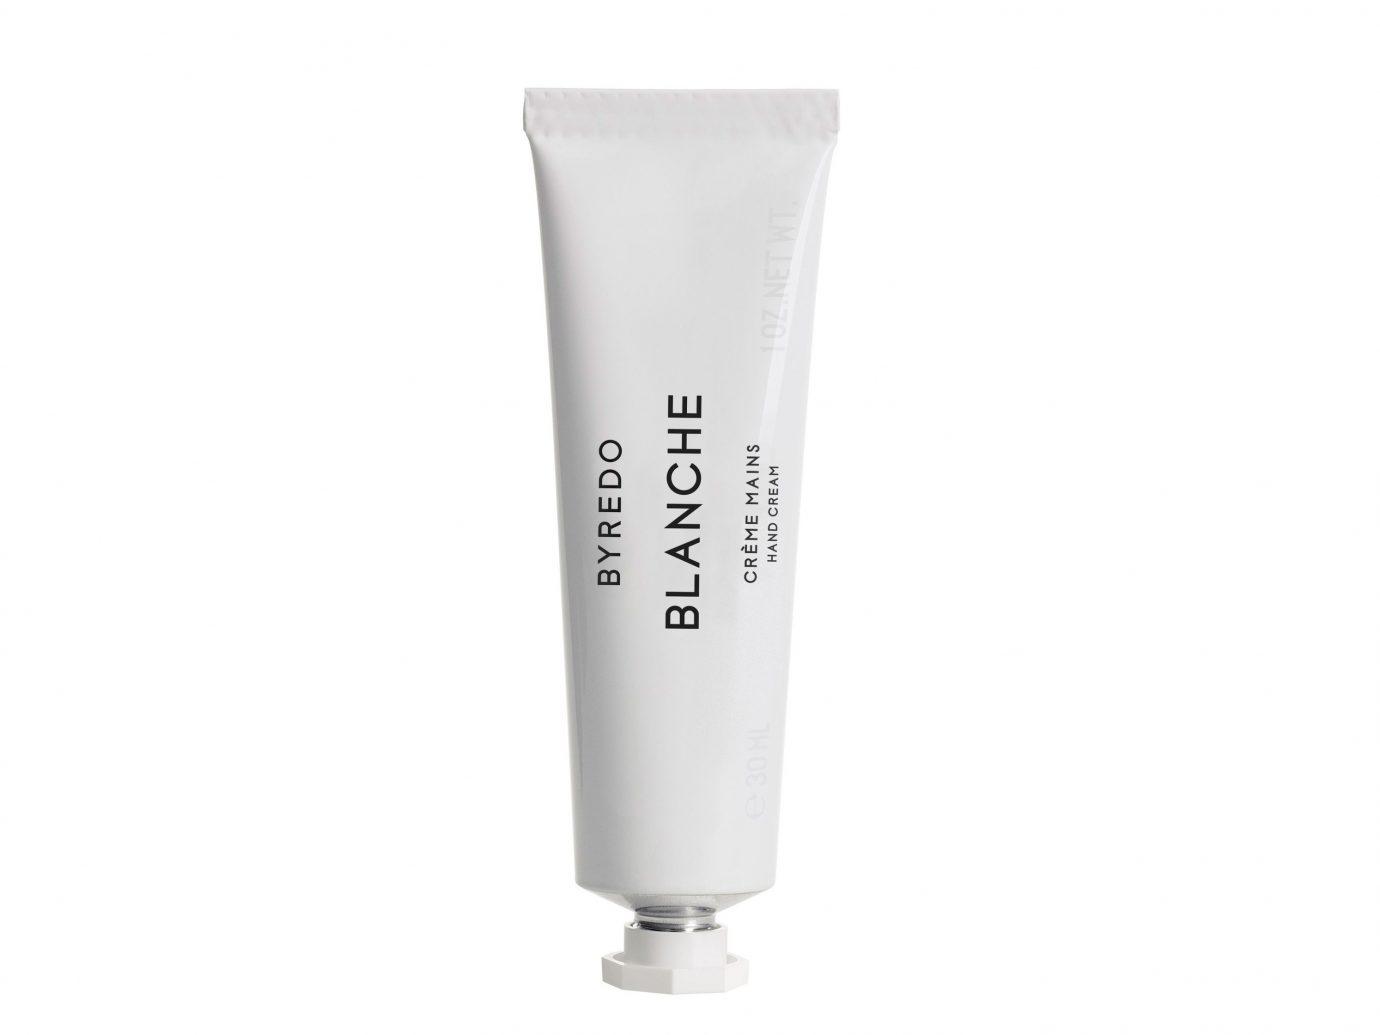 Wellness toiletry product lotion skin cream cosmetics hand cream skin care